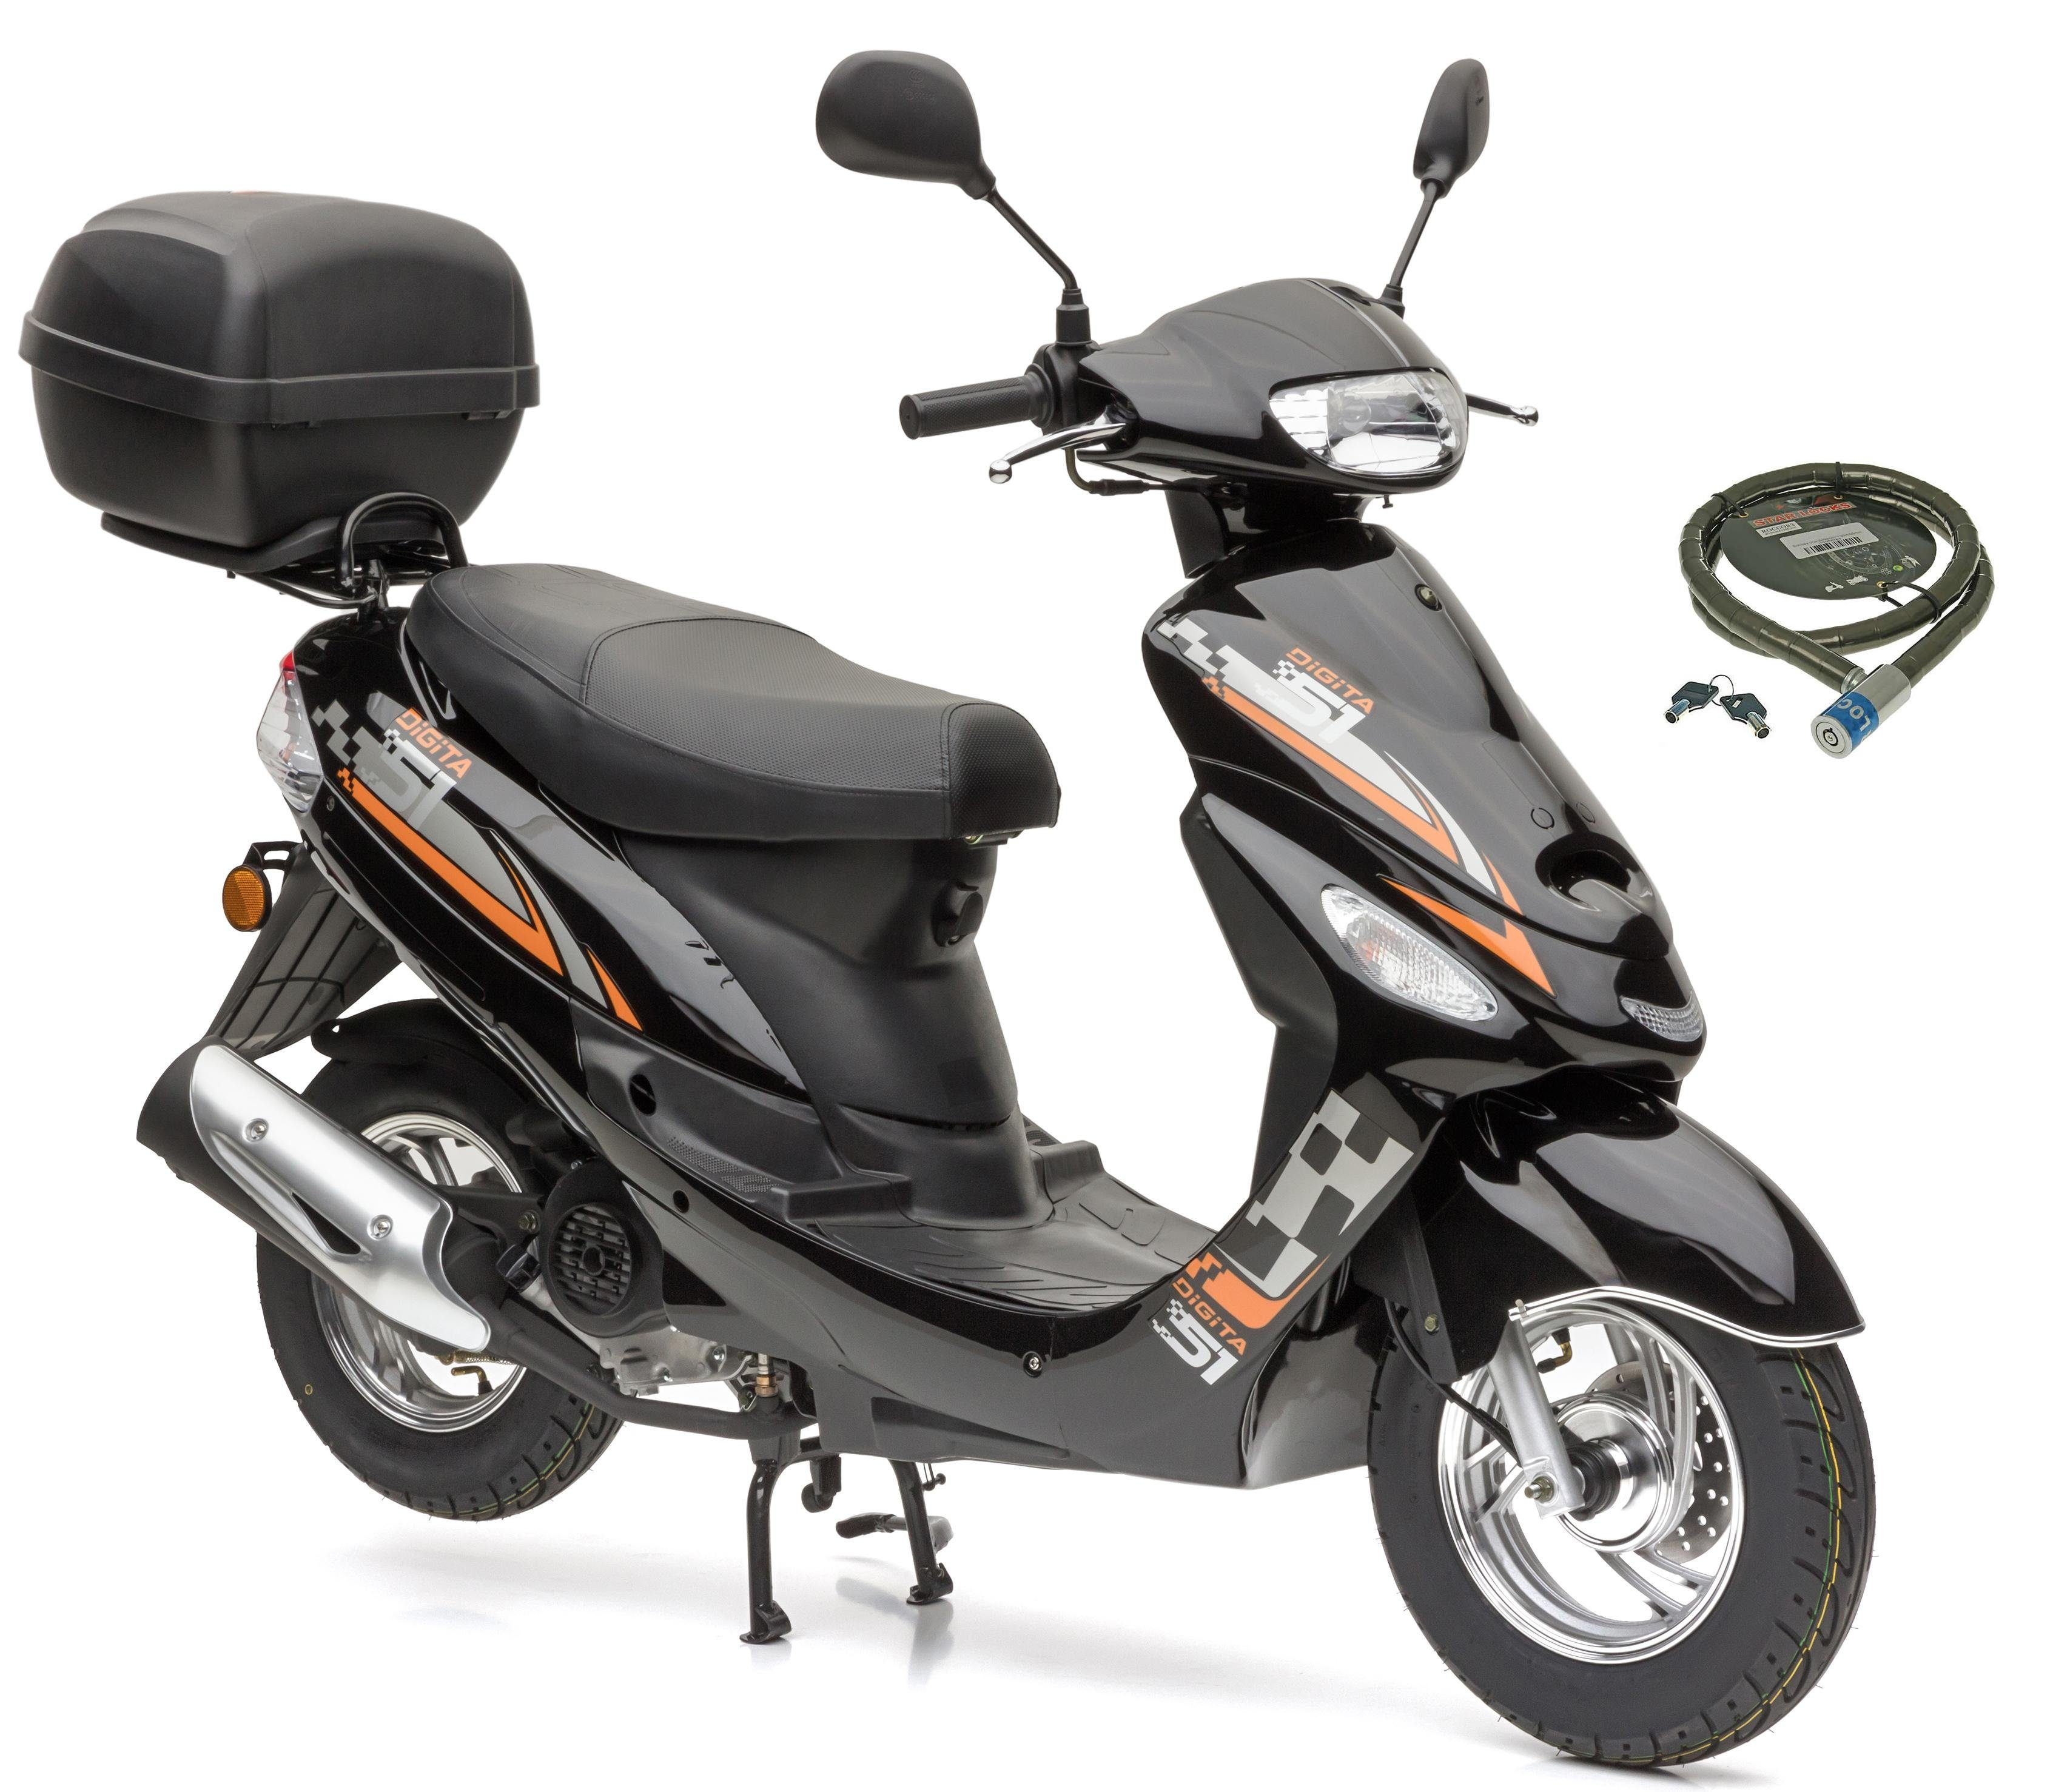 Nova Motors Motorroller »City Star«, 49 ccm, 45 km/h, Euro 4, (Set, mit Topcase), inkl. Topcase, 49 ccm, 45 km/h